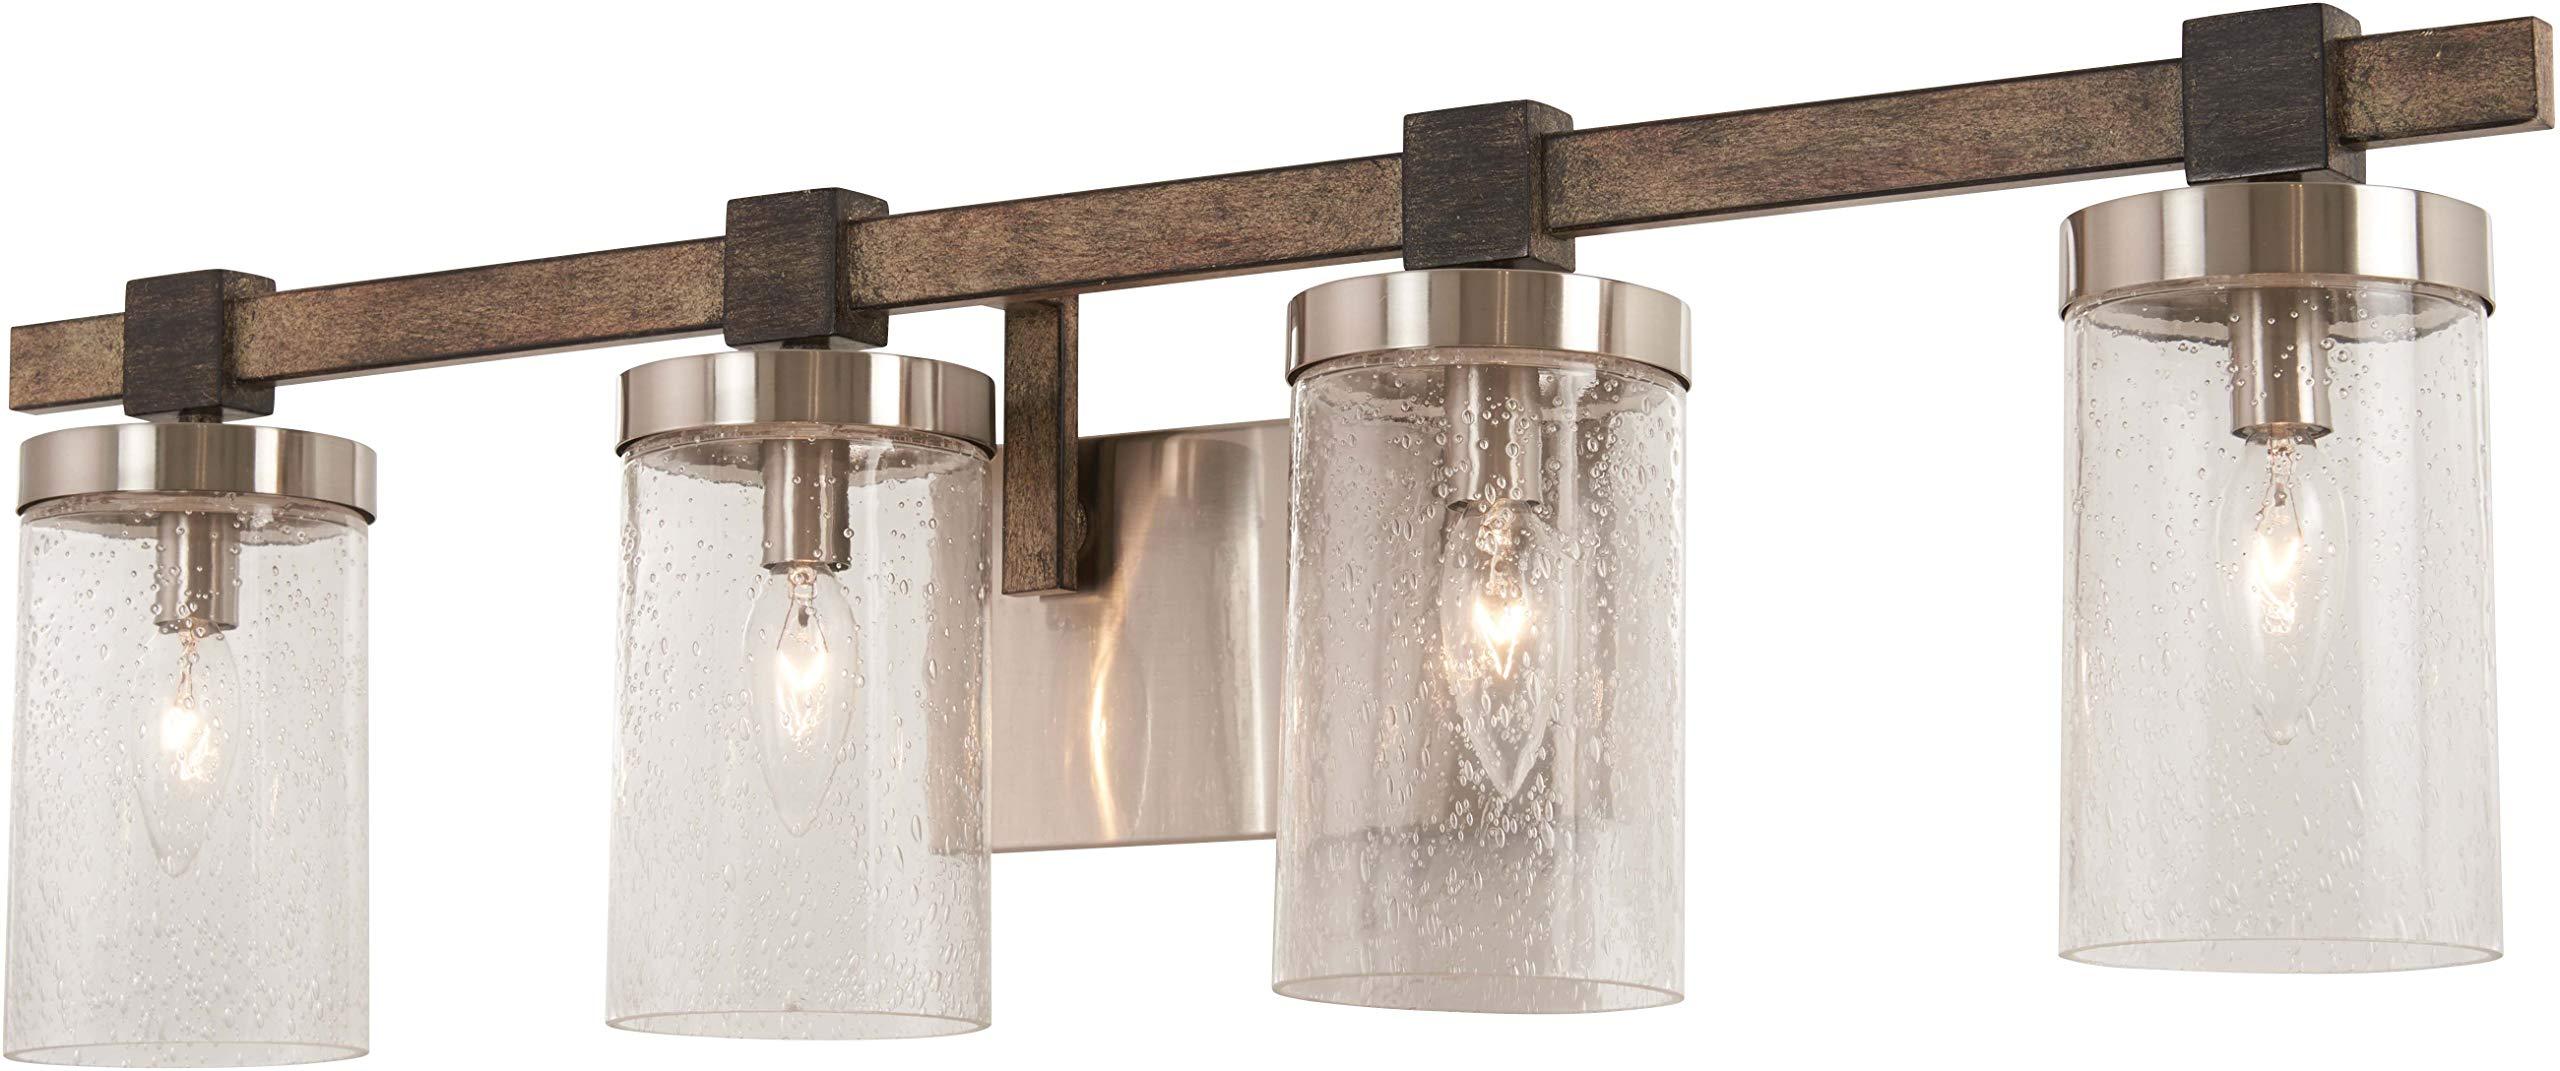 Minka Lavery Wall Light Fixtures 4634-106 Bridlewood Bath Vanity Lighting, 4-Light 240 Watts, Stone Grey